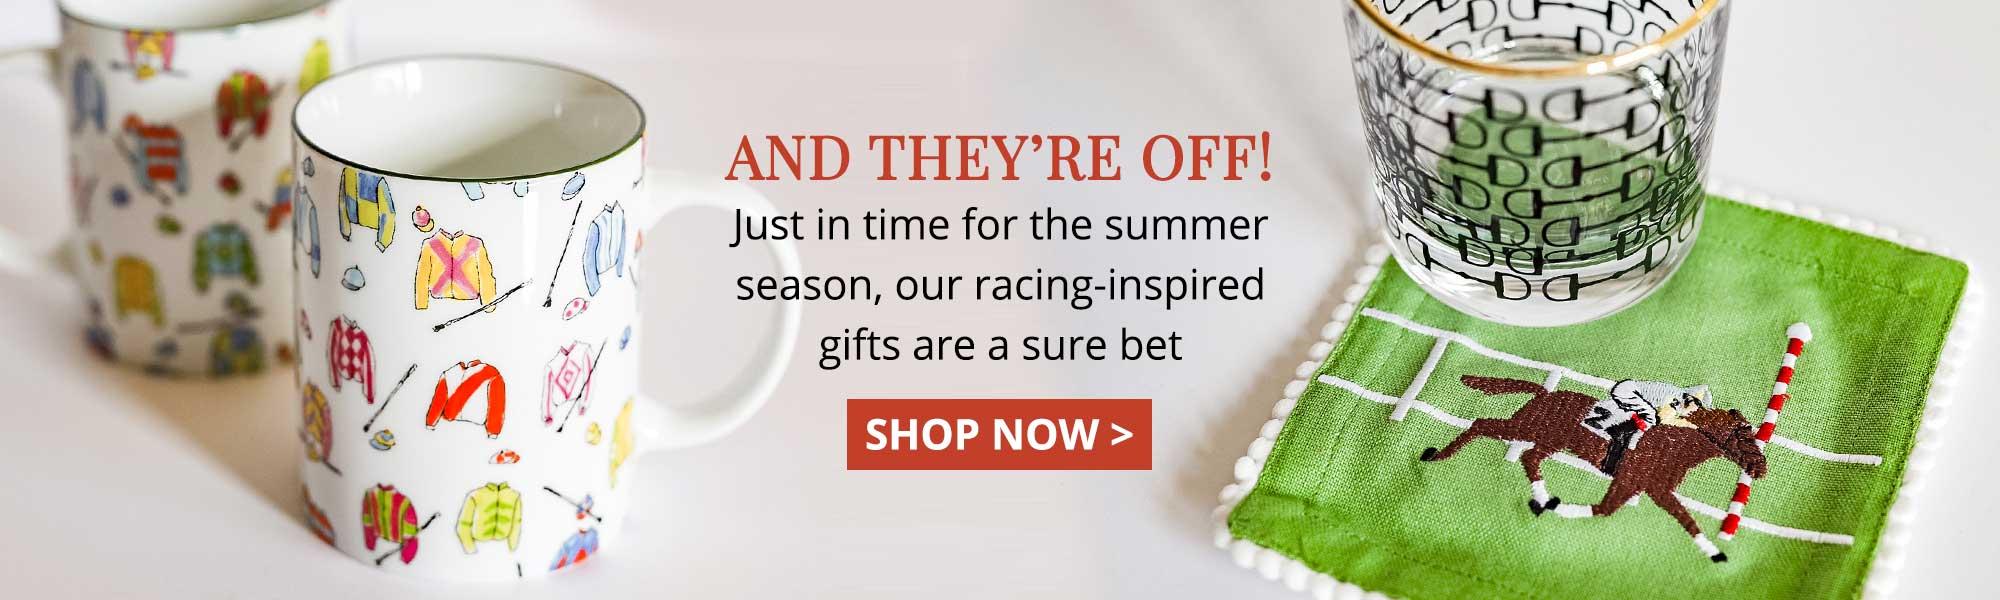 Racing Gifts